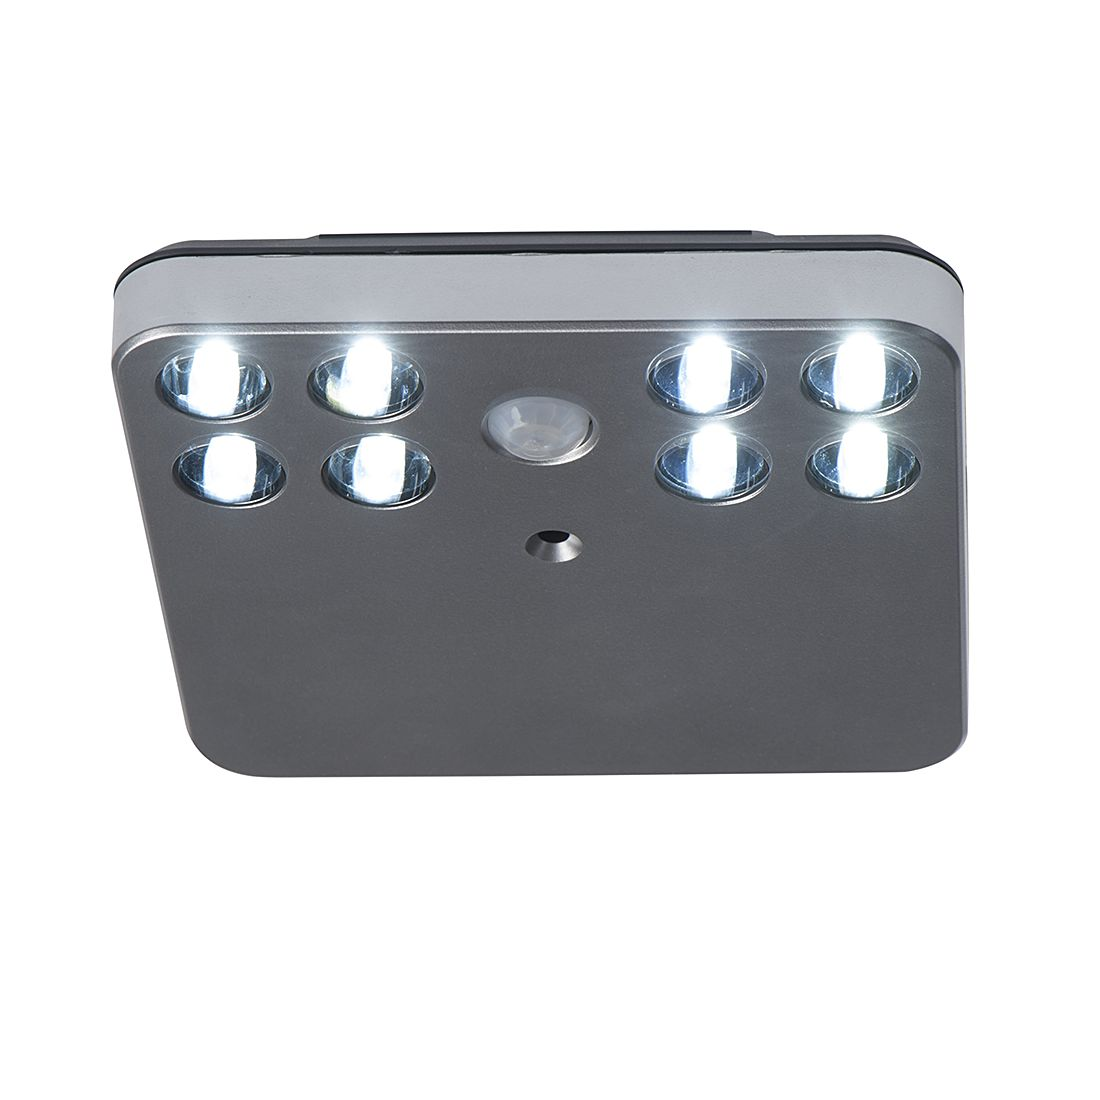 Schrank Innenbeleuchtung Küche ~ LEDInnenbeleuchtung Santa Cruz (2erSet)  Schrankinfo  Schrank